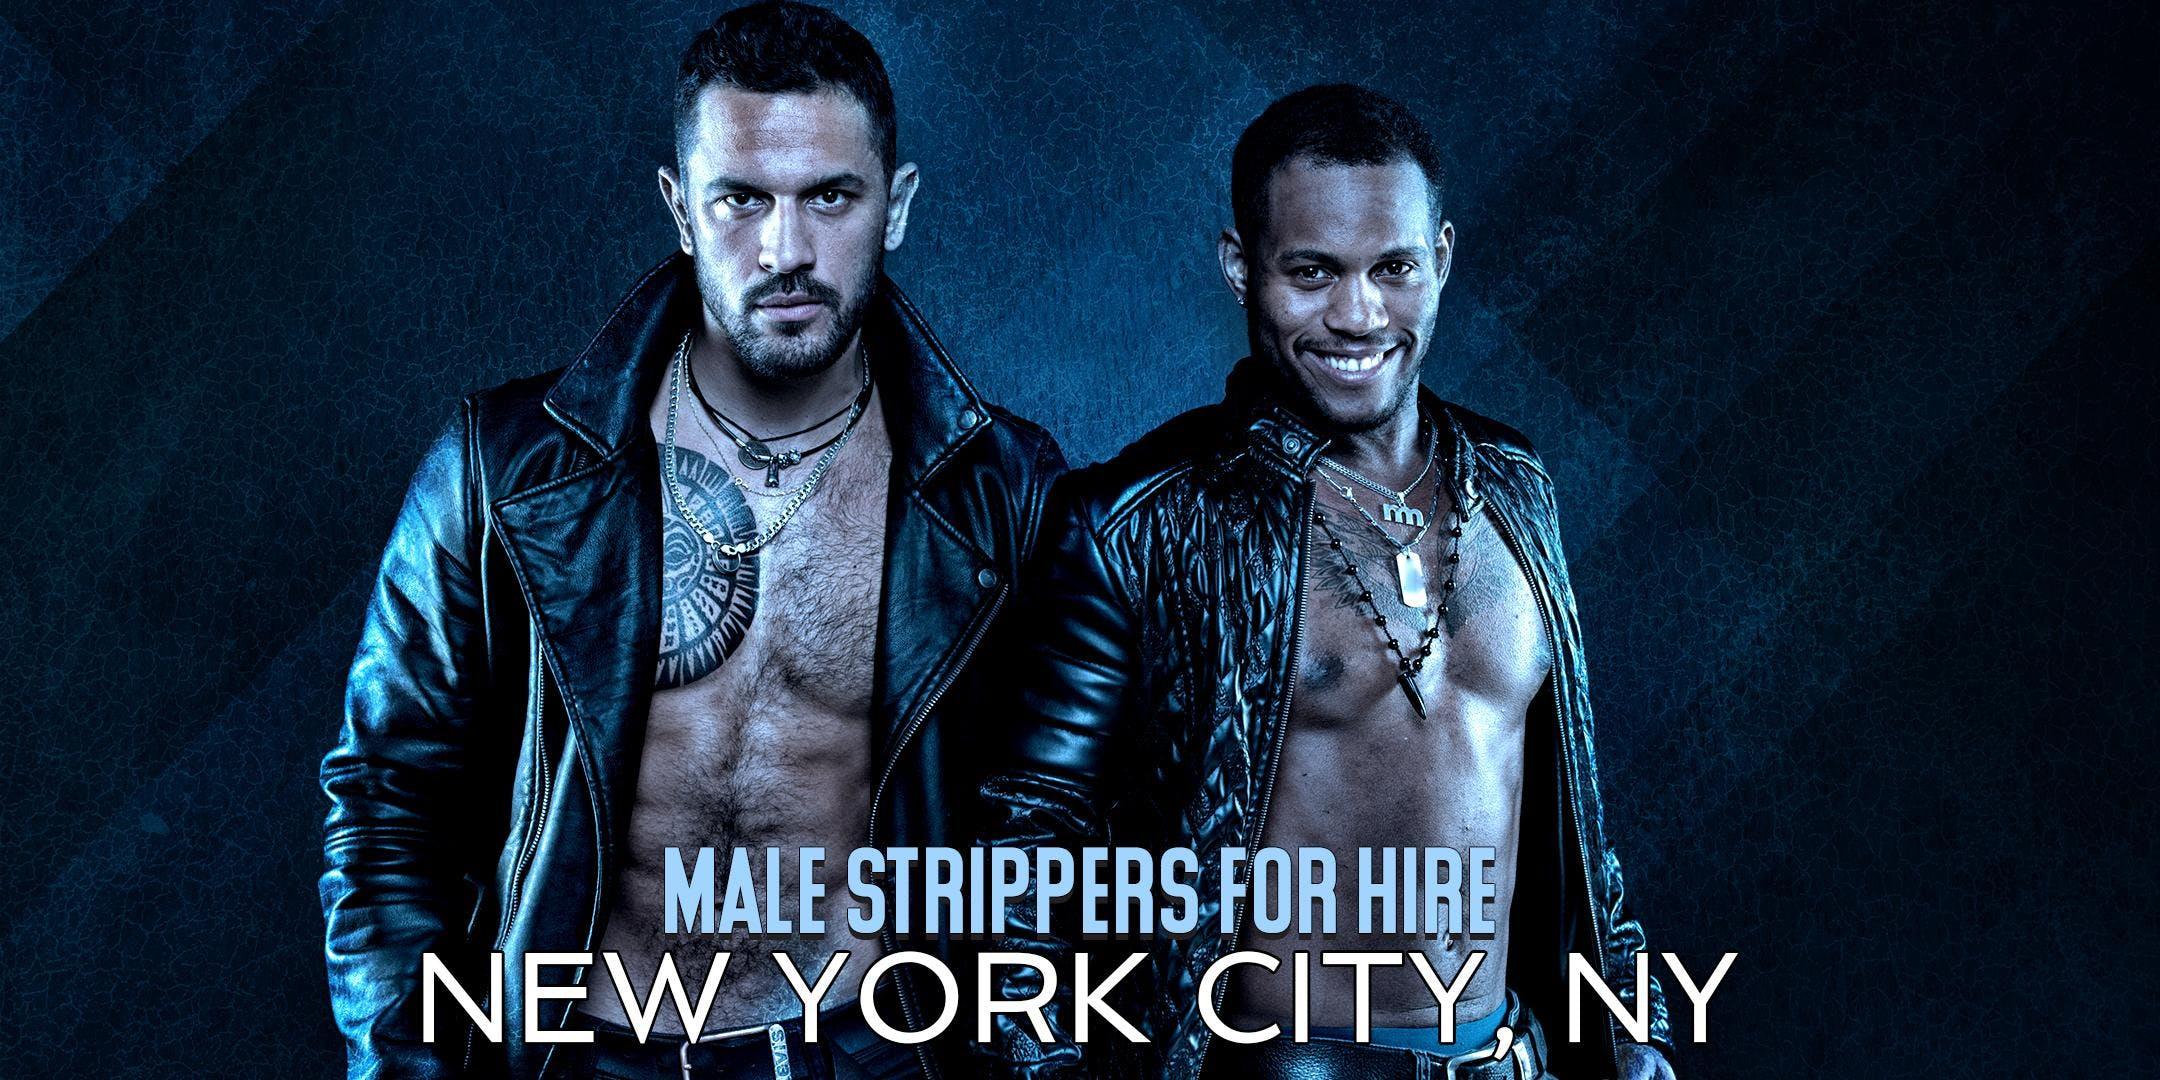 Hire a Male Stripper New York City NY - Private Party Male Strippers for  Hire New York City